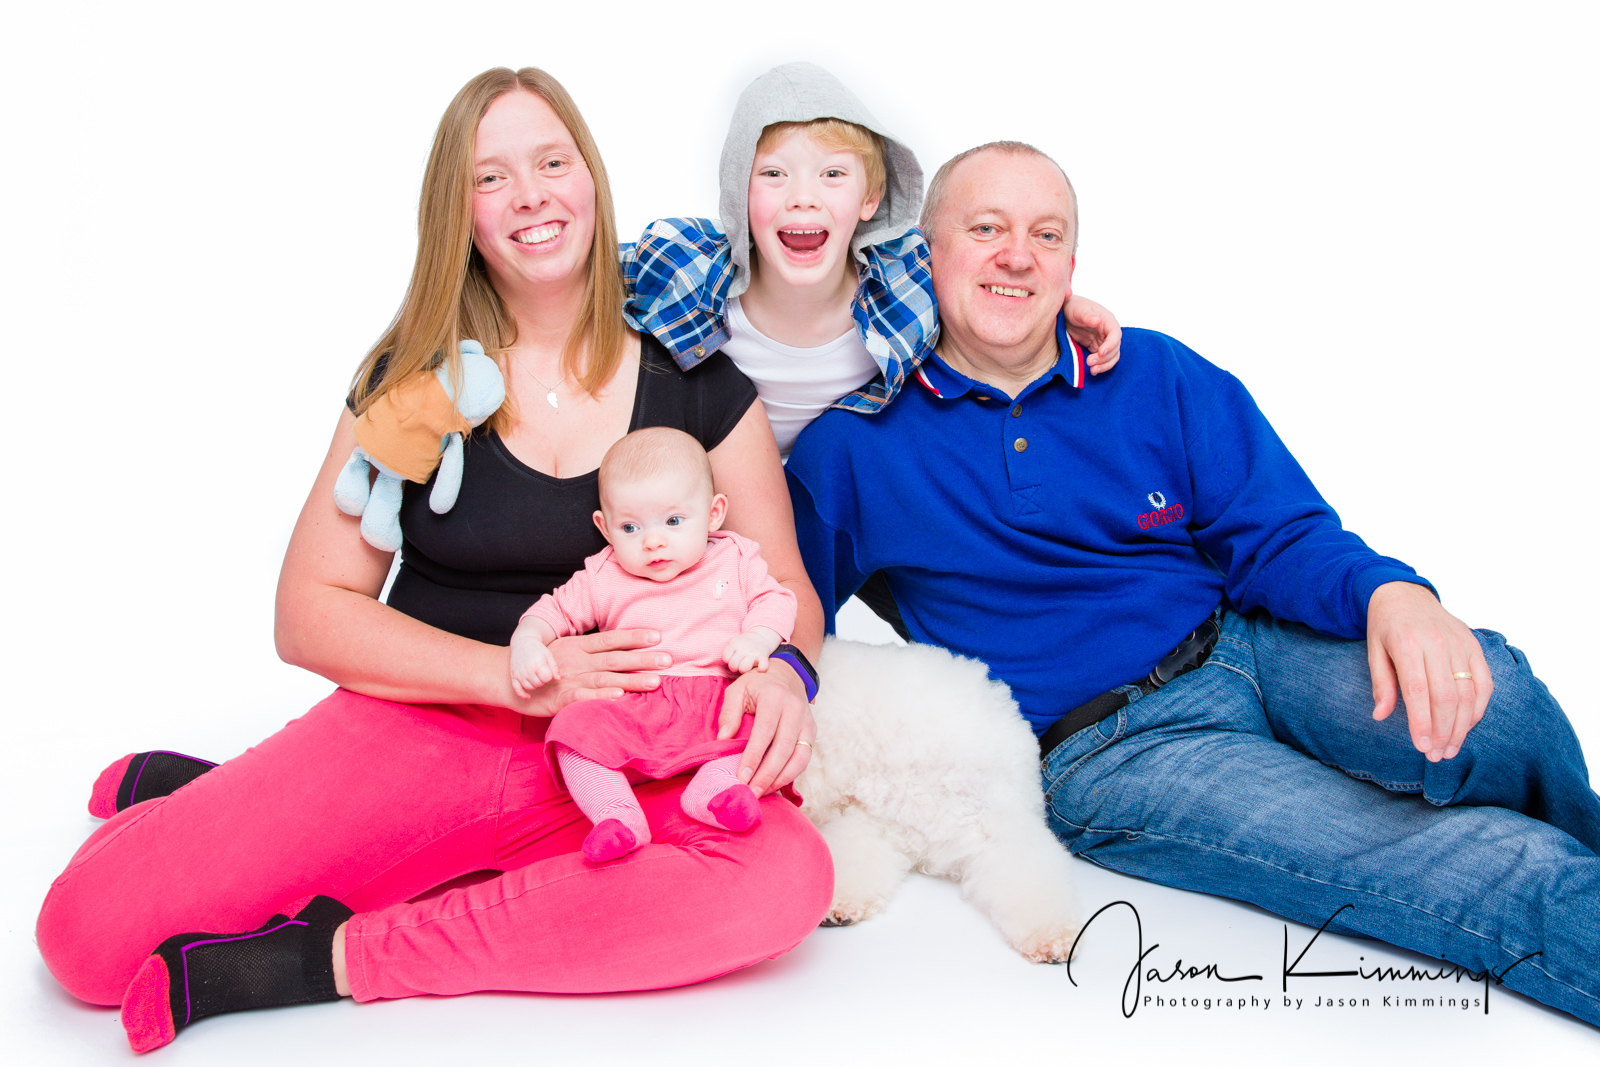 Family-photography-west-lothian-edinburgh-glasgow-1.jpg